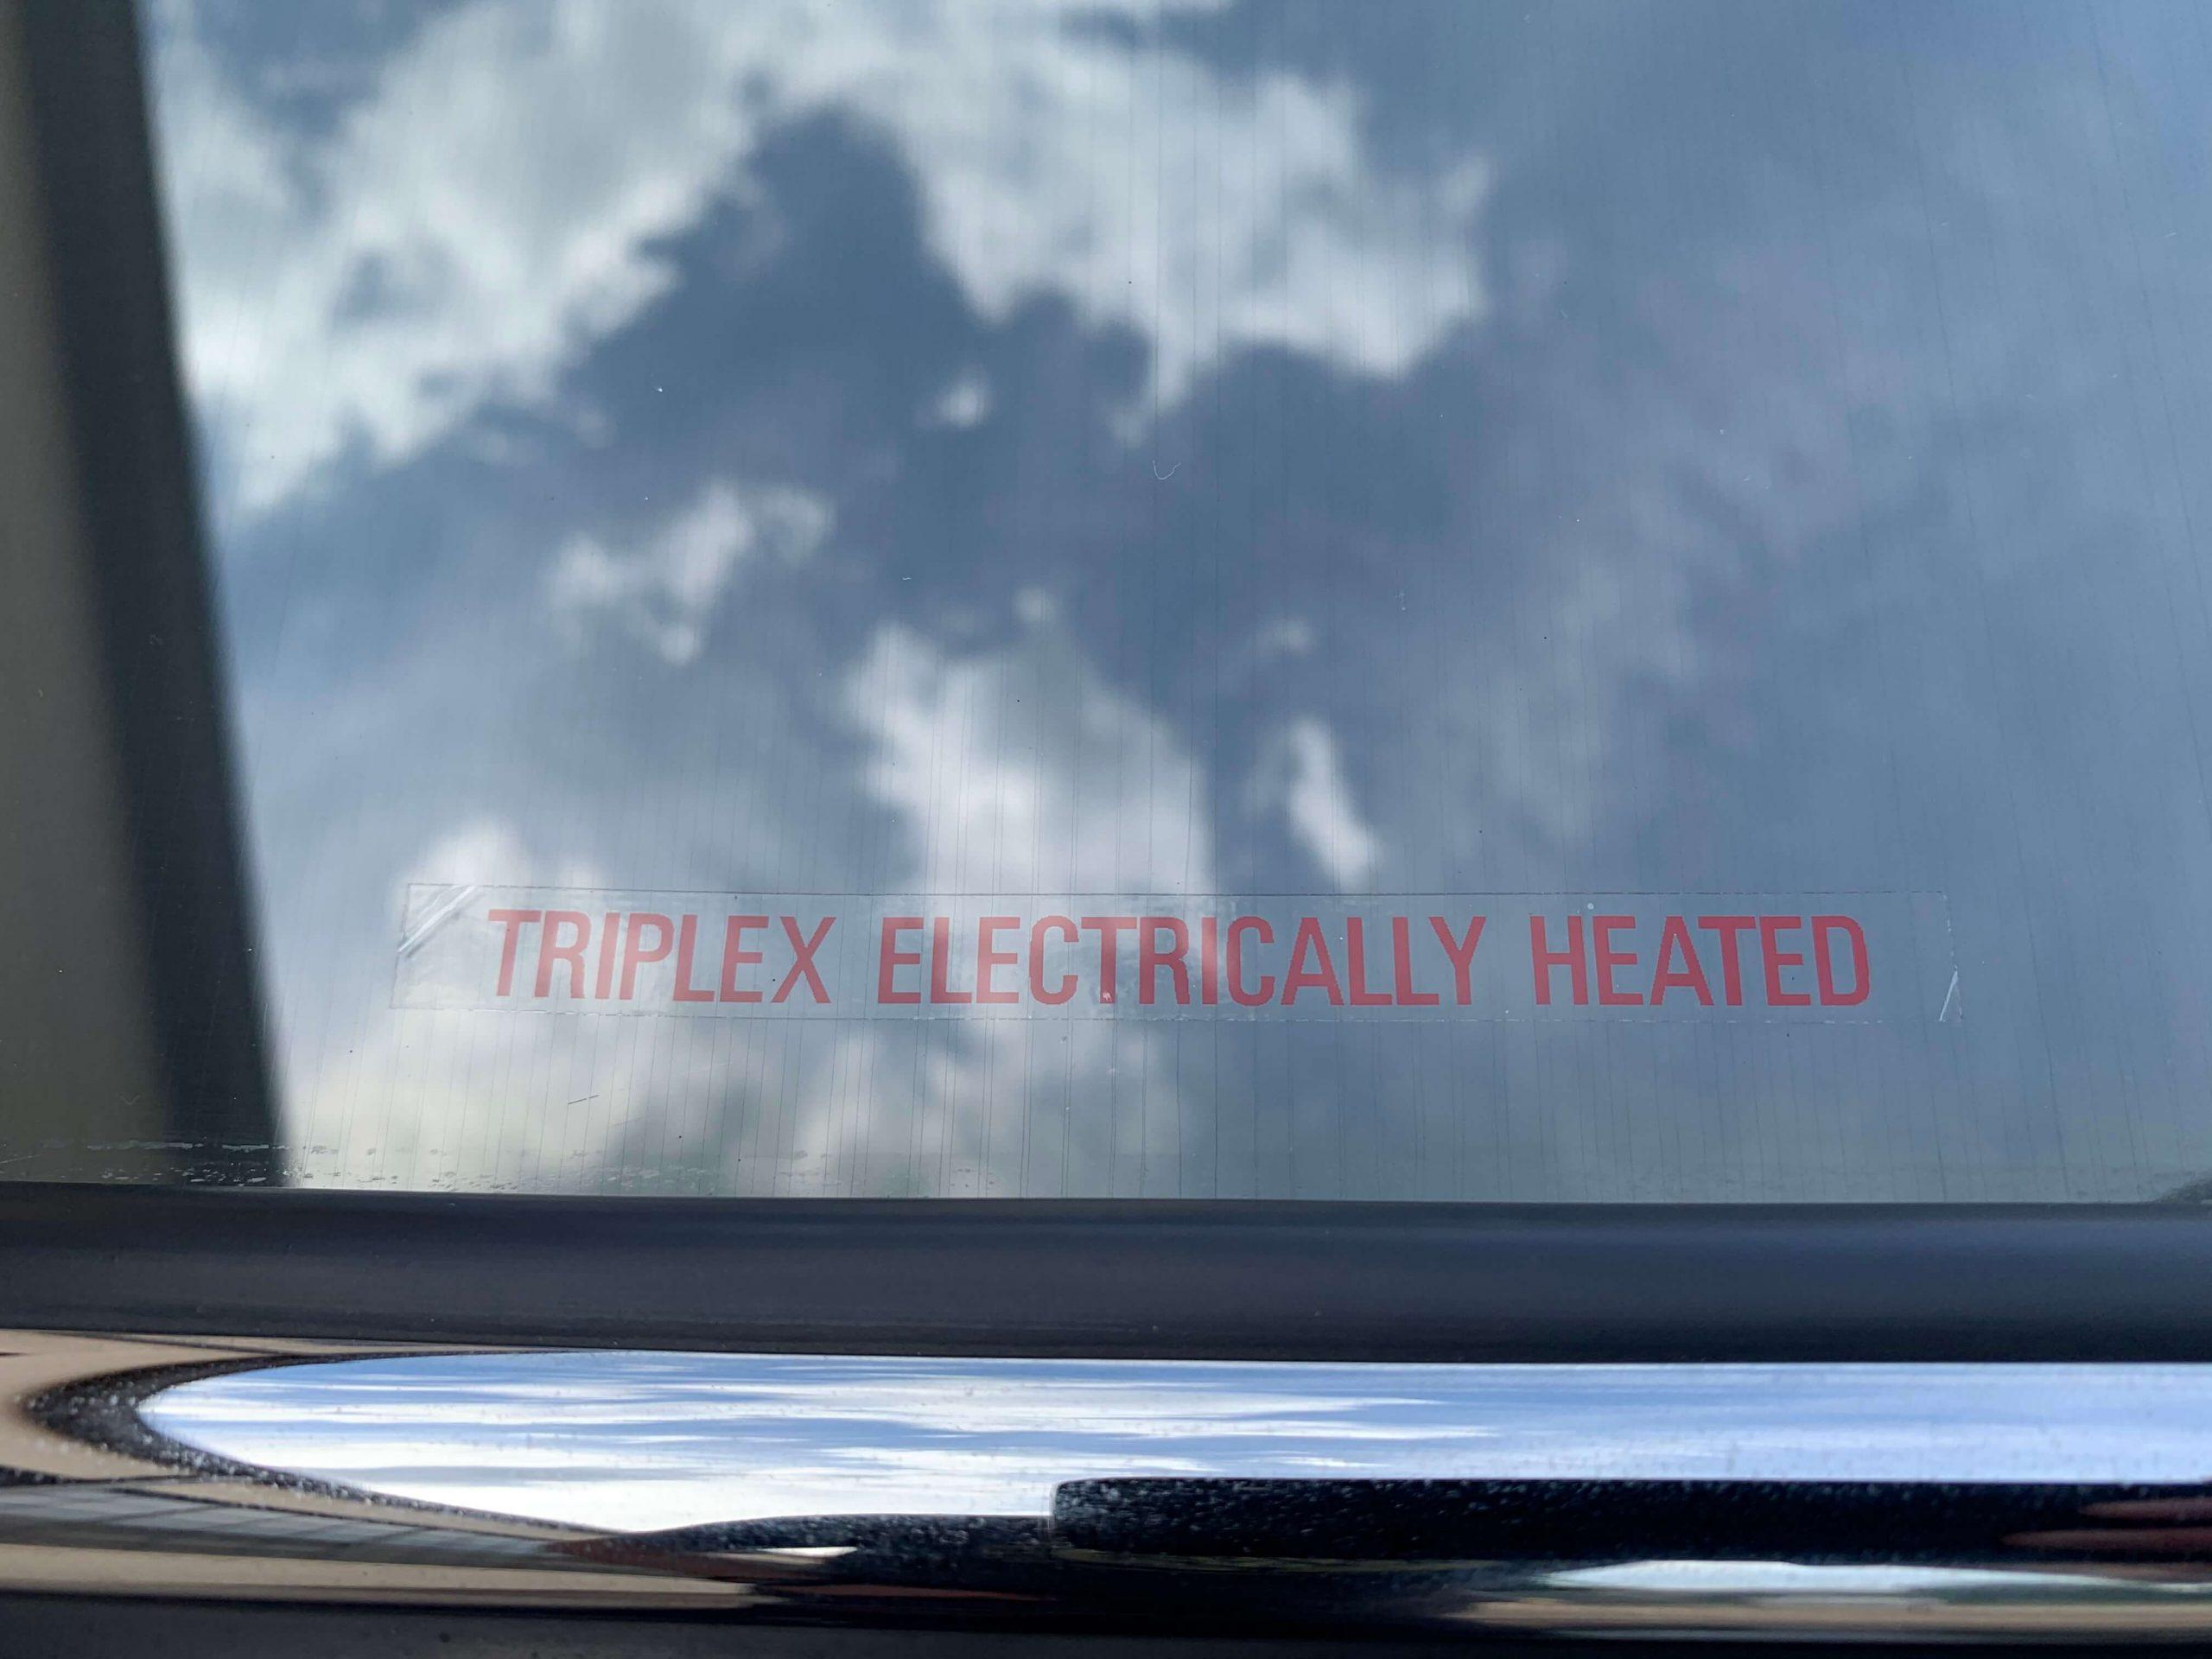 Ferrari 330 GTC Heated rear glass